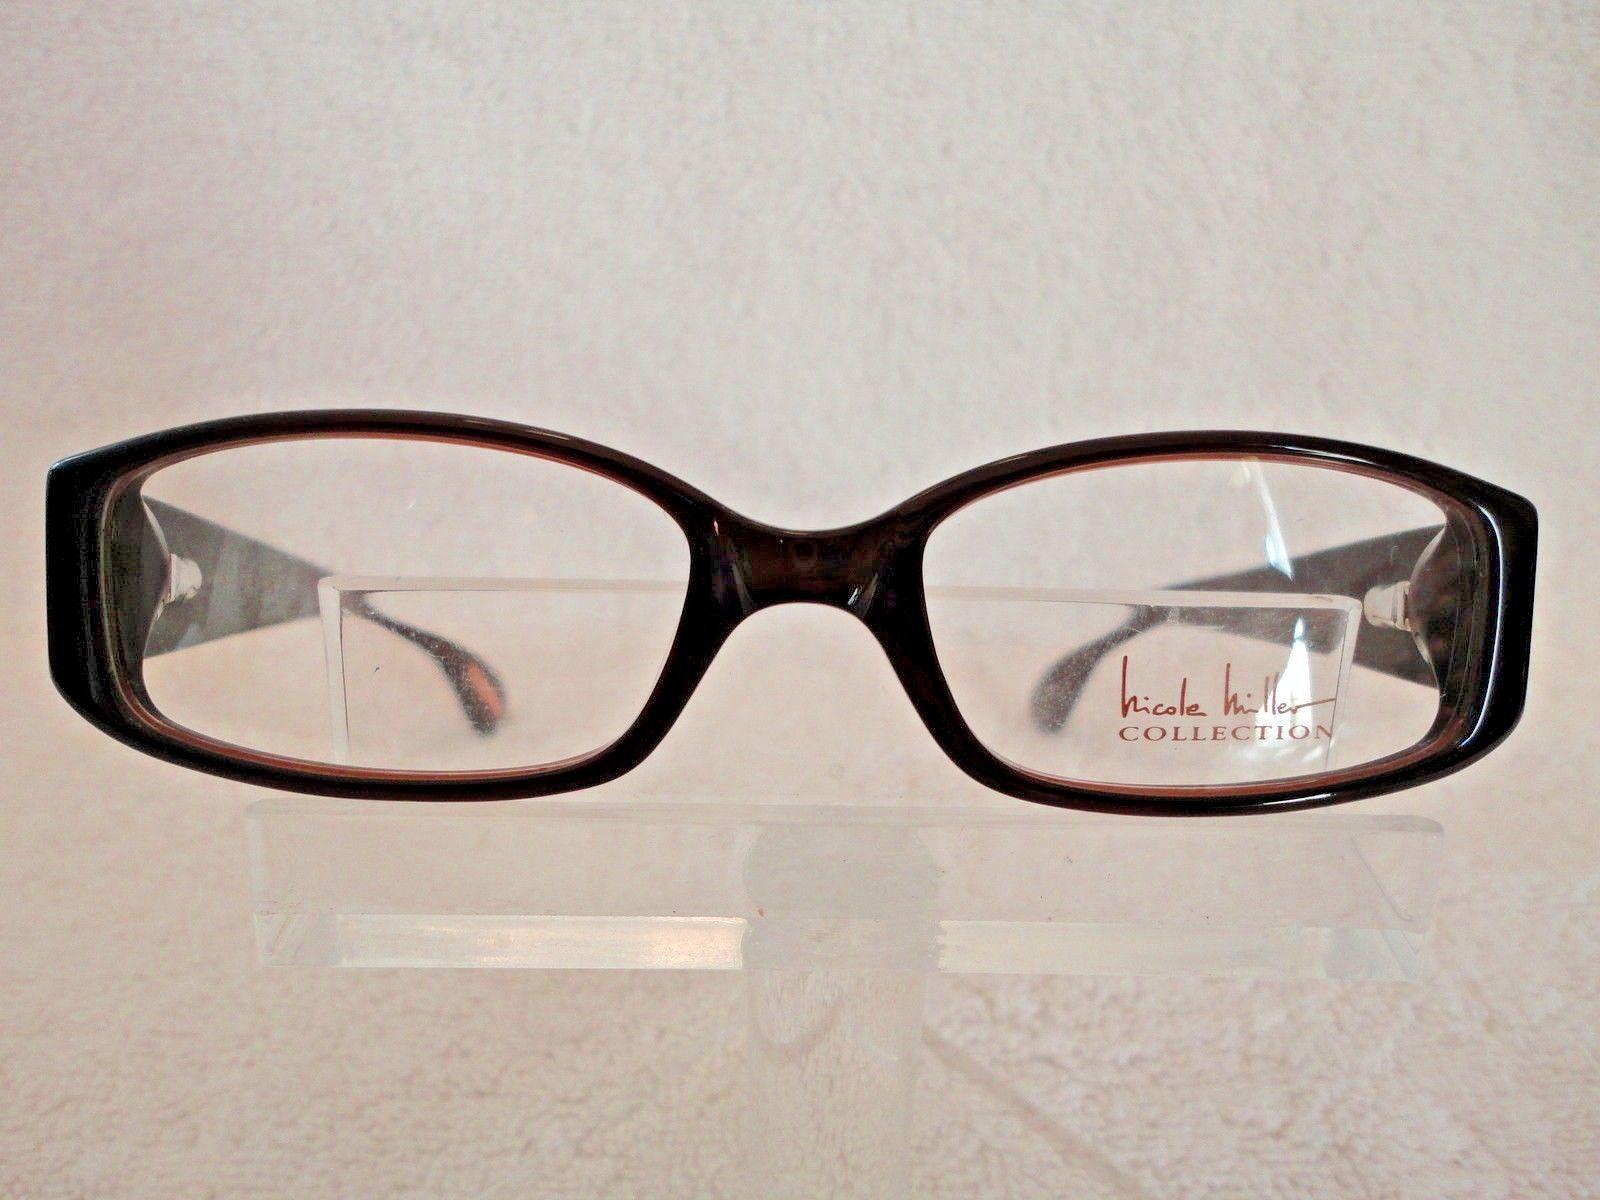 Nicole Miller Lefleur in Mocha 47 X 16 130 mm Eyeglass Frame - $24.70